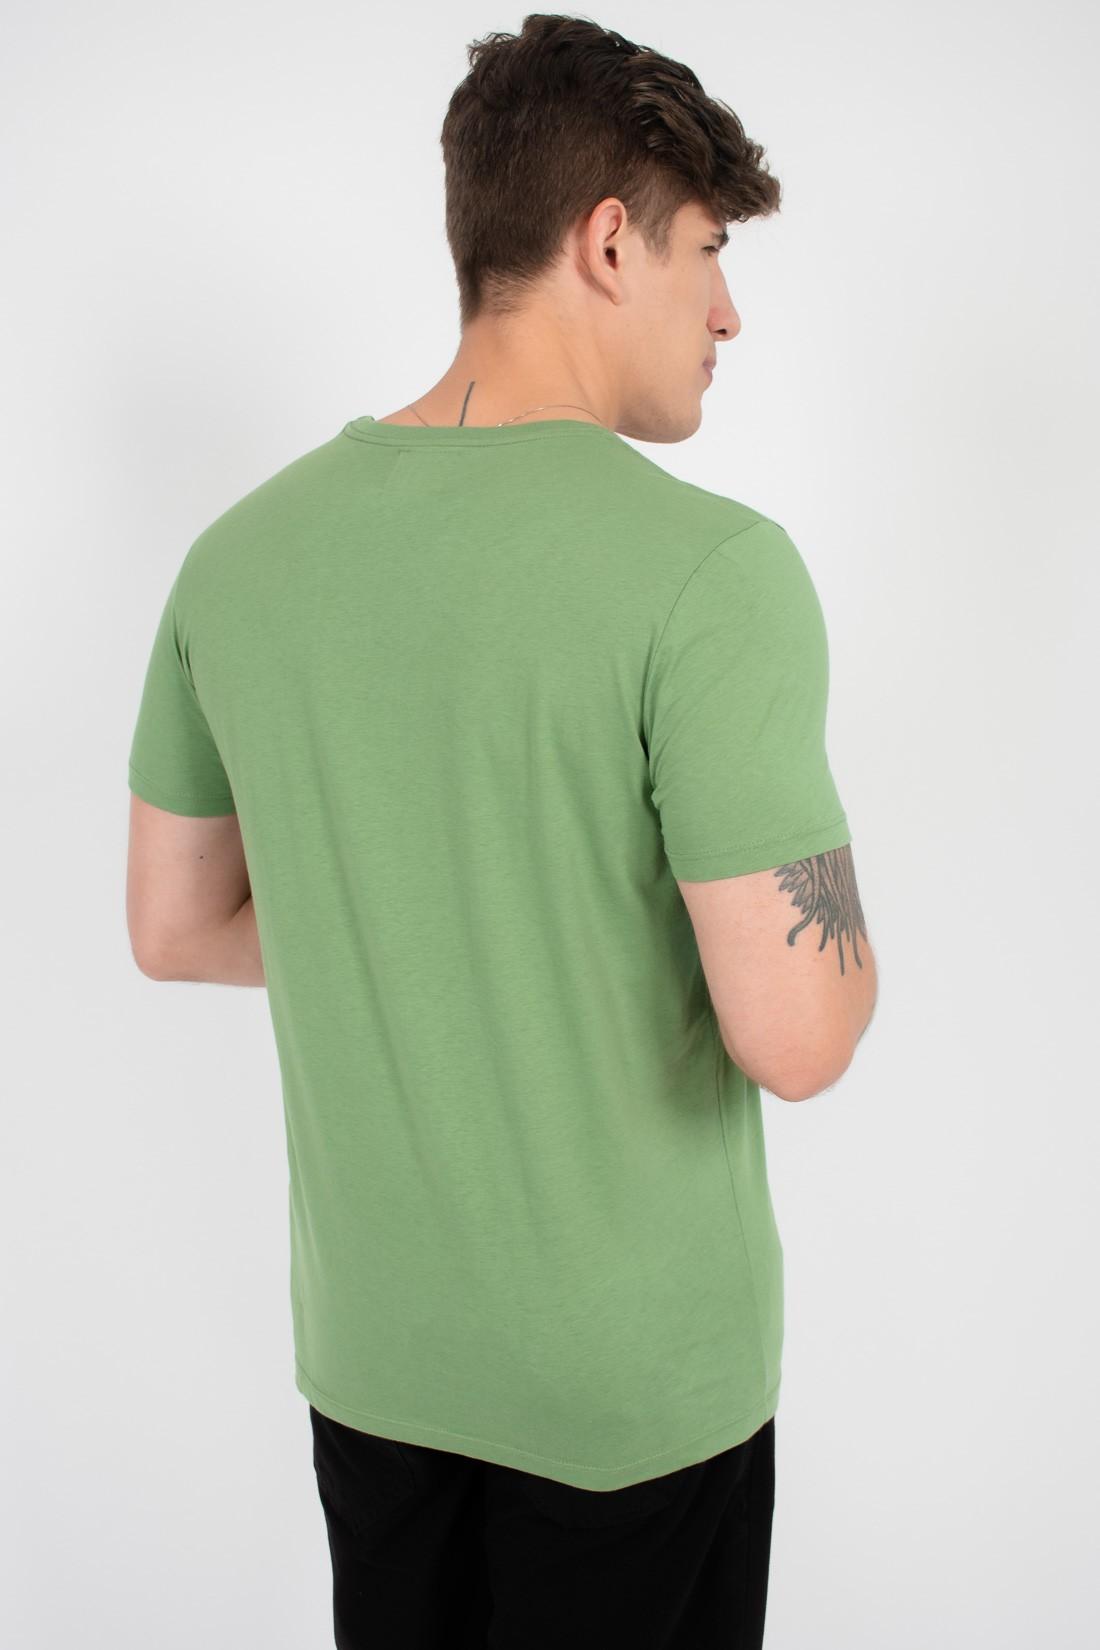 Camiseta Mc Colcci Summer Party Beach